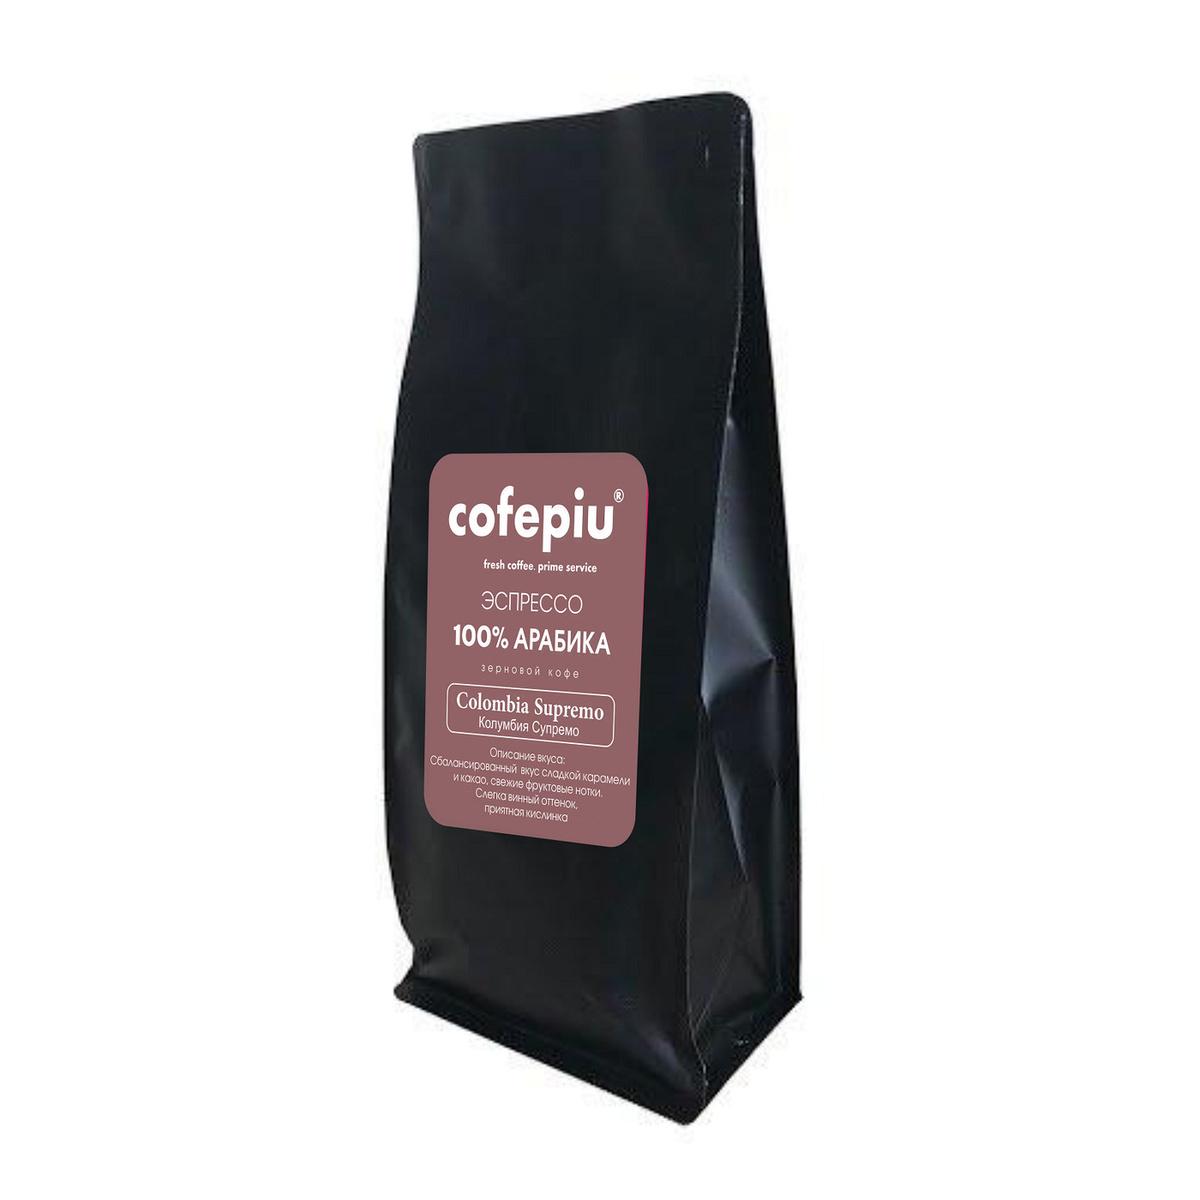 Кофе в зернах COFEPIU Colombia Supremo 100% арабика, 1 кг. #1